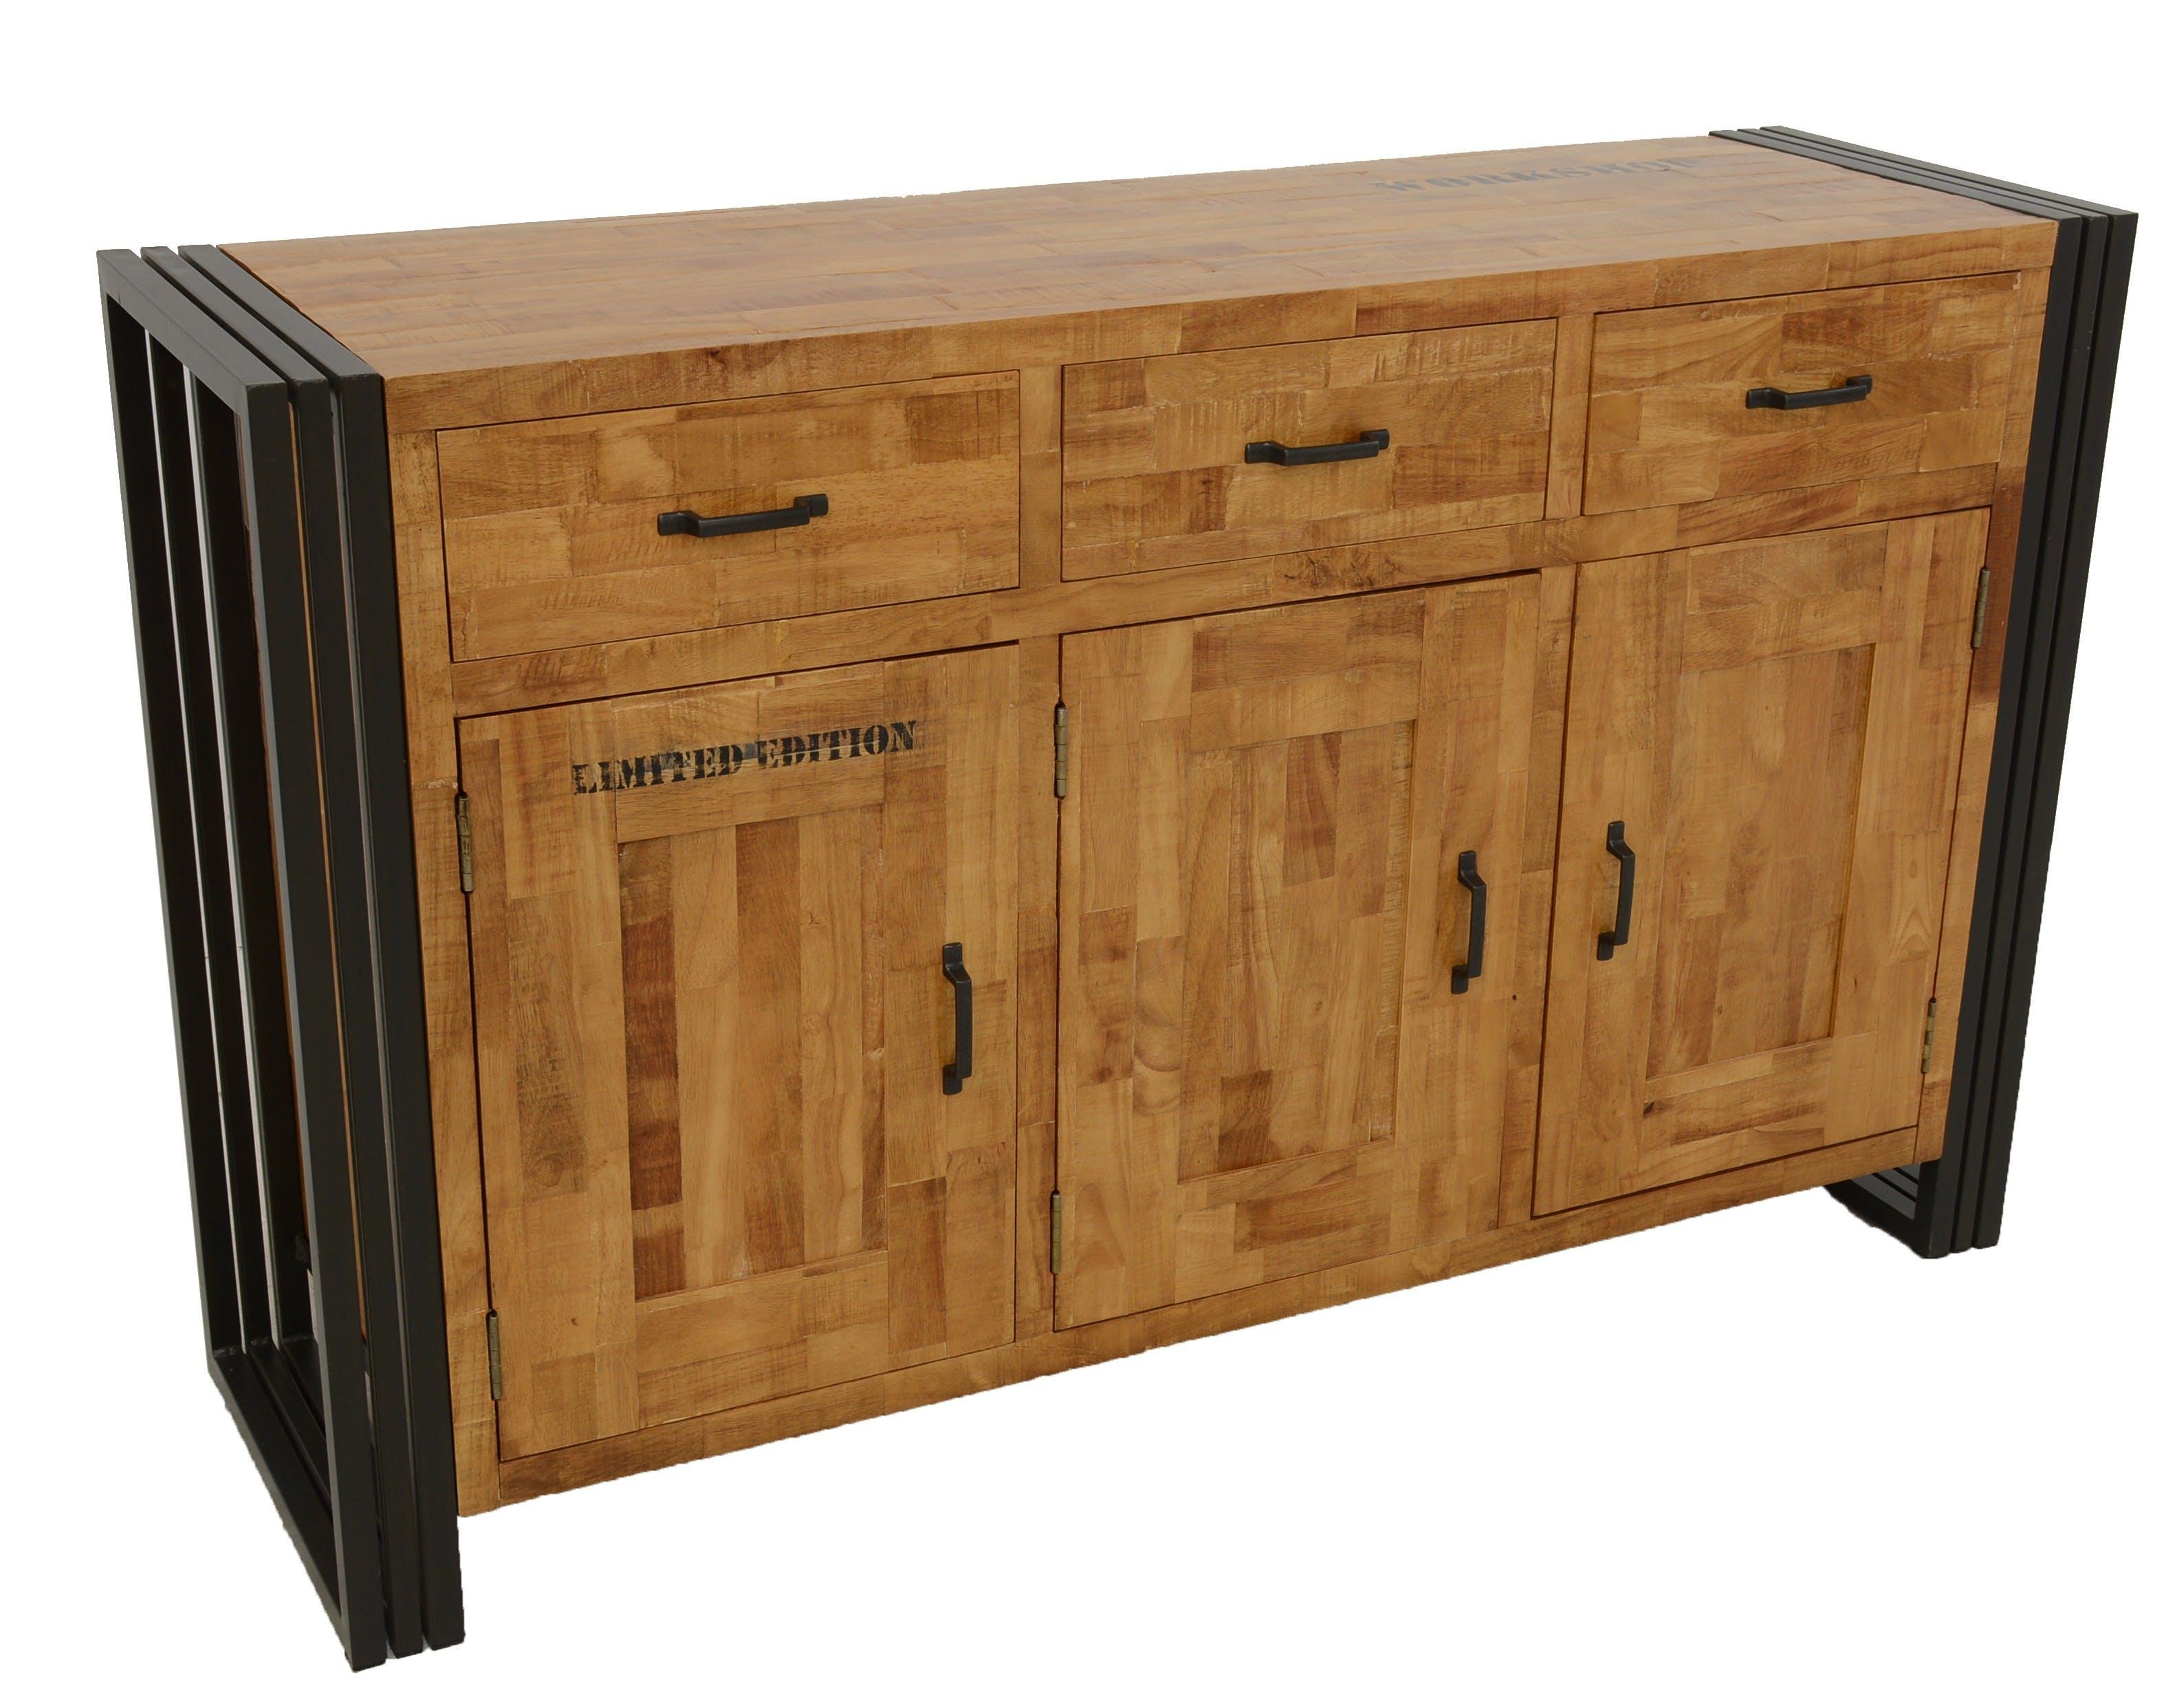 Buffet enfilade hévéa recyclé naturel et métal noirci 3 tiroirs 3 portes 150X45X90cm DOCKER